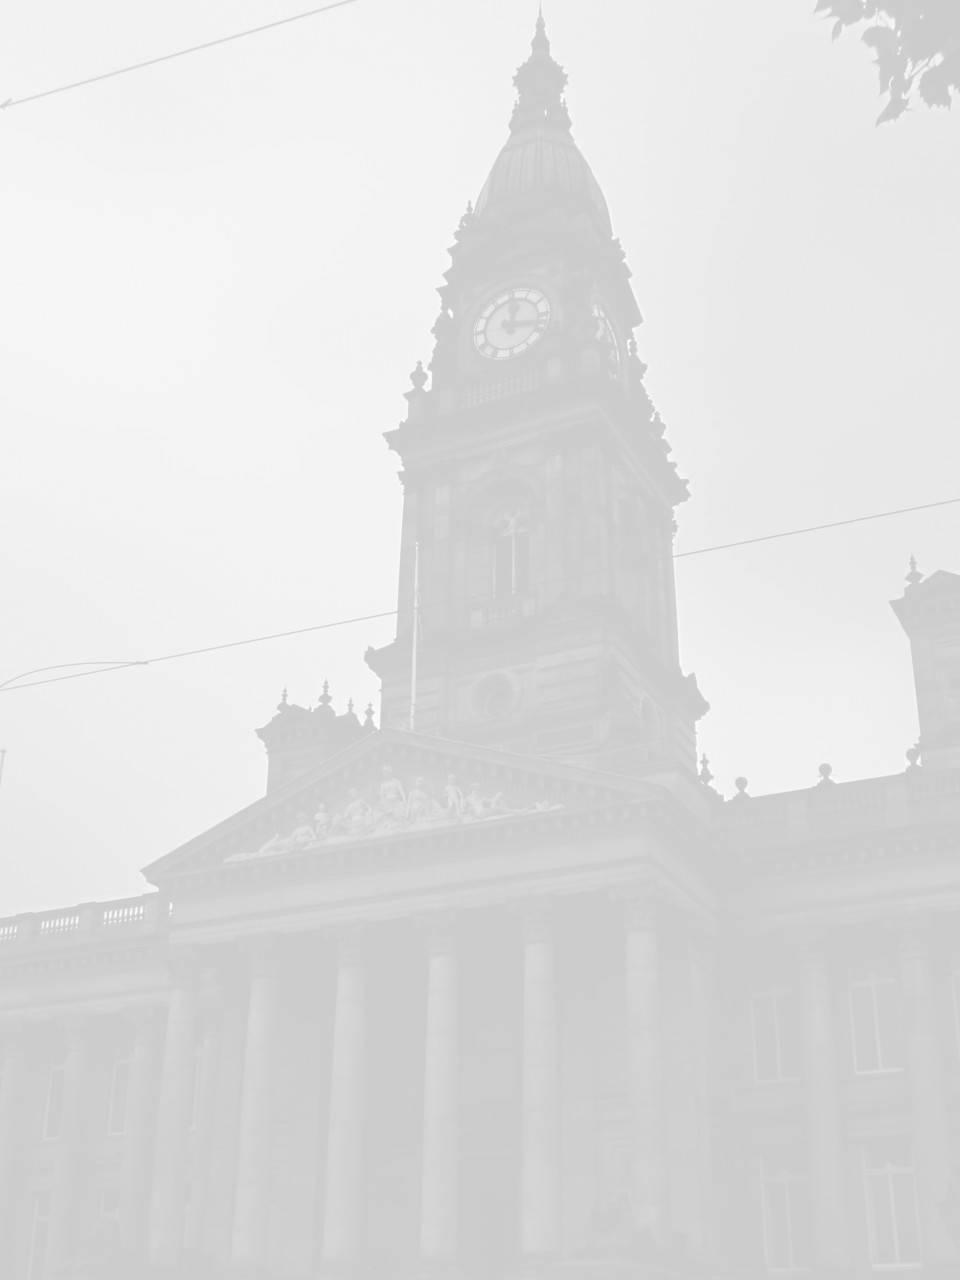 seo bolton image of bolton town hall